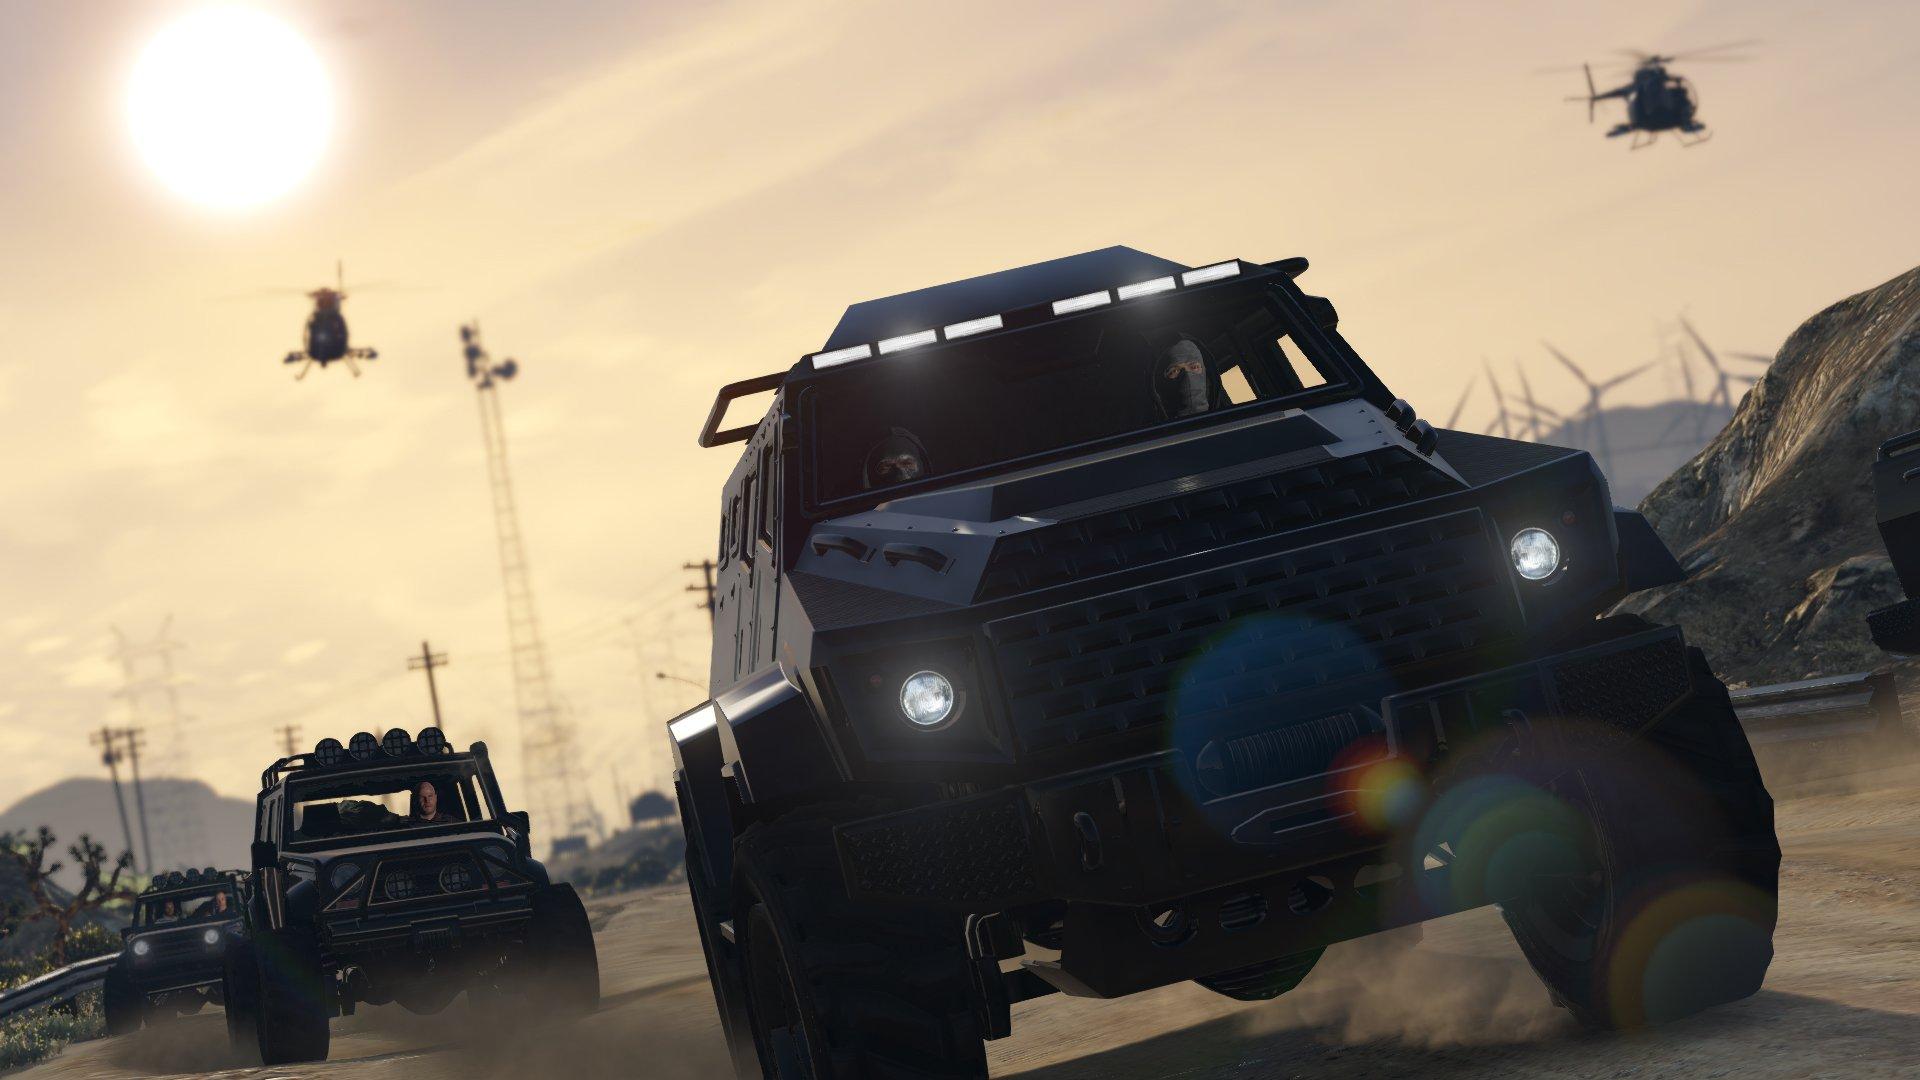 san andreas cheats playstation 3 with Grand Theft Auto Online on Code Gta 5 Gta 20V  20xbox 20arabe moreover Cars moreover Gta San Andreas as well  moreover Gta 3 Resimleri.